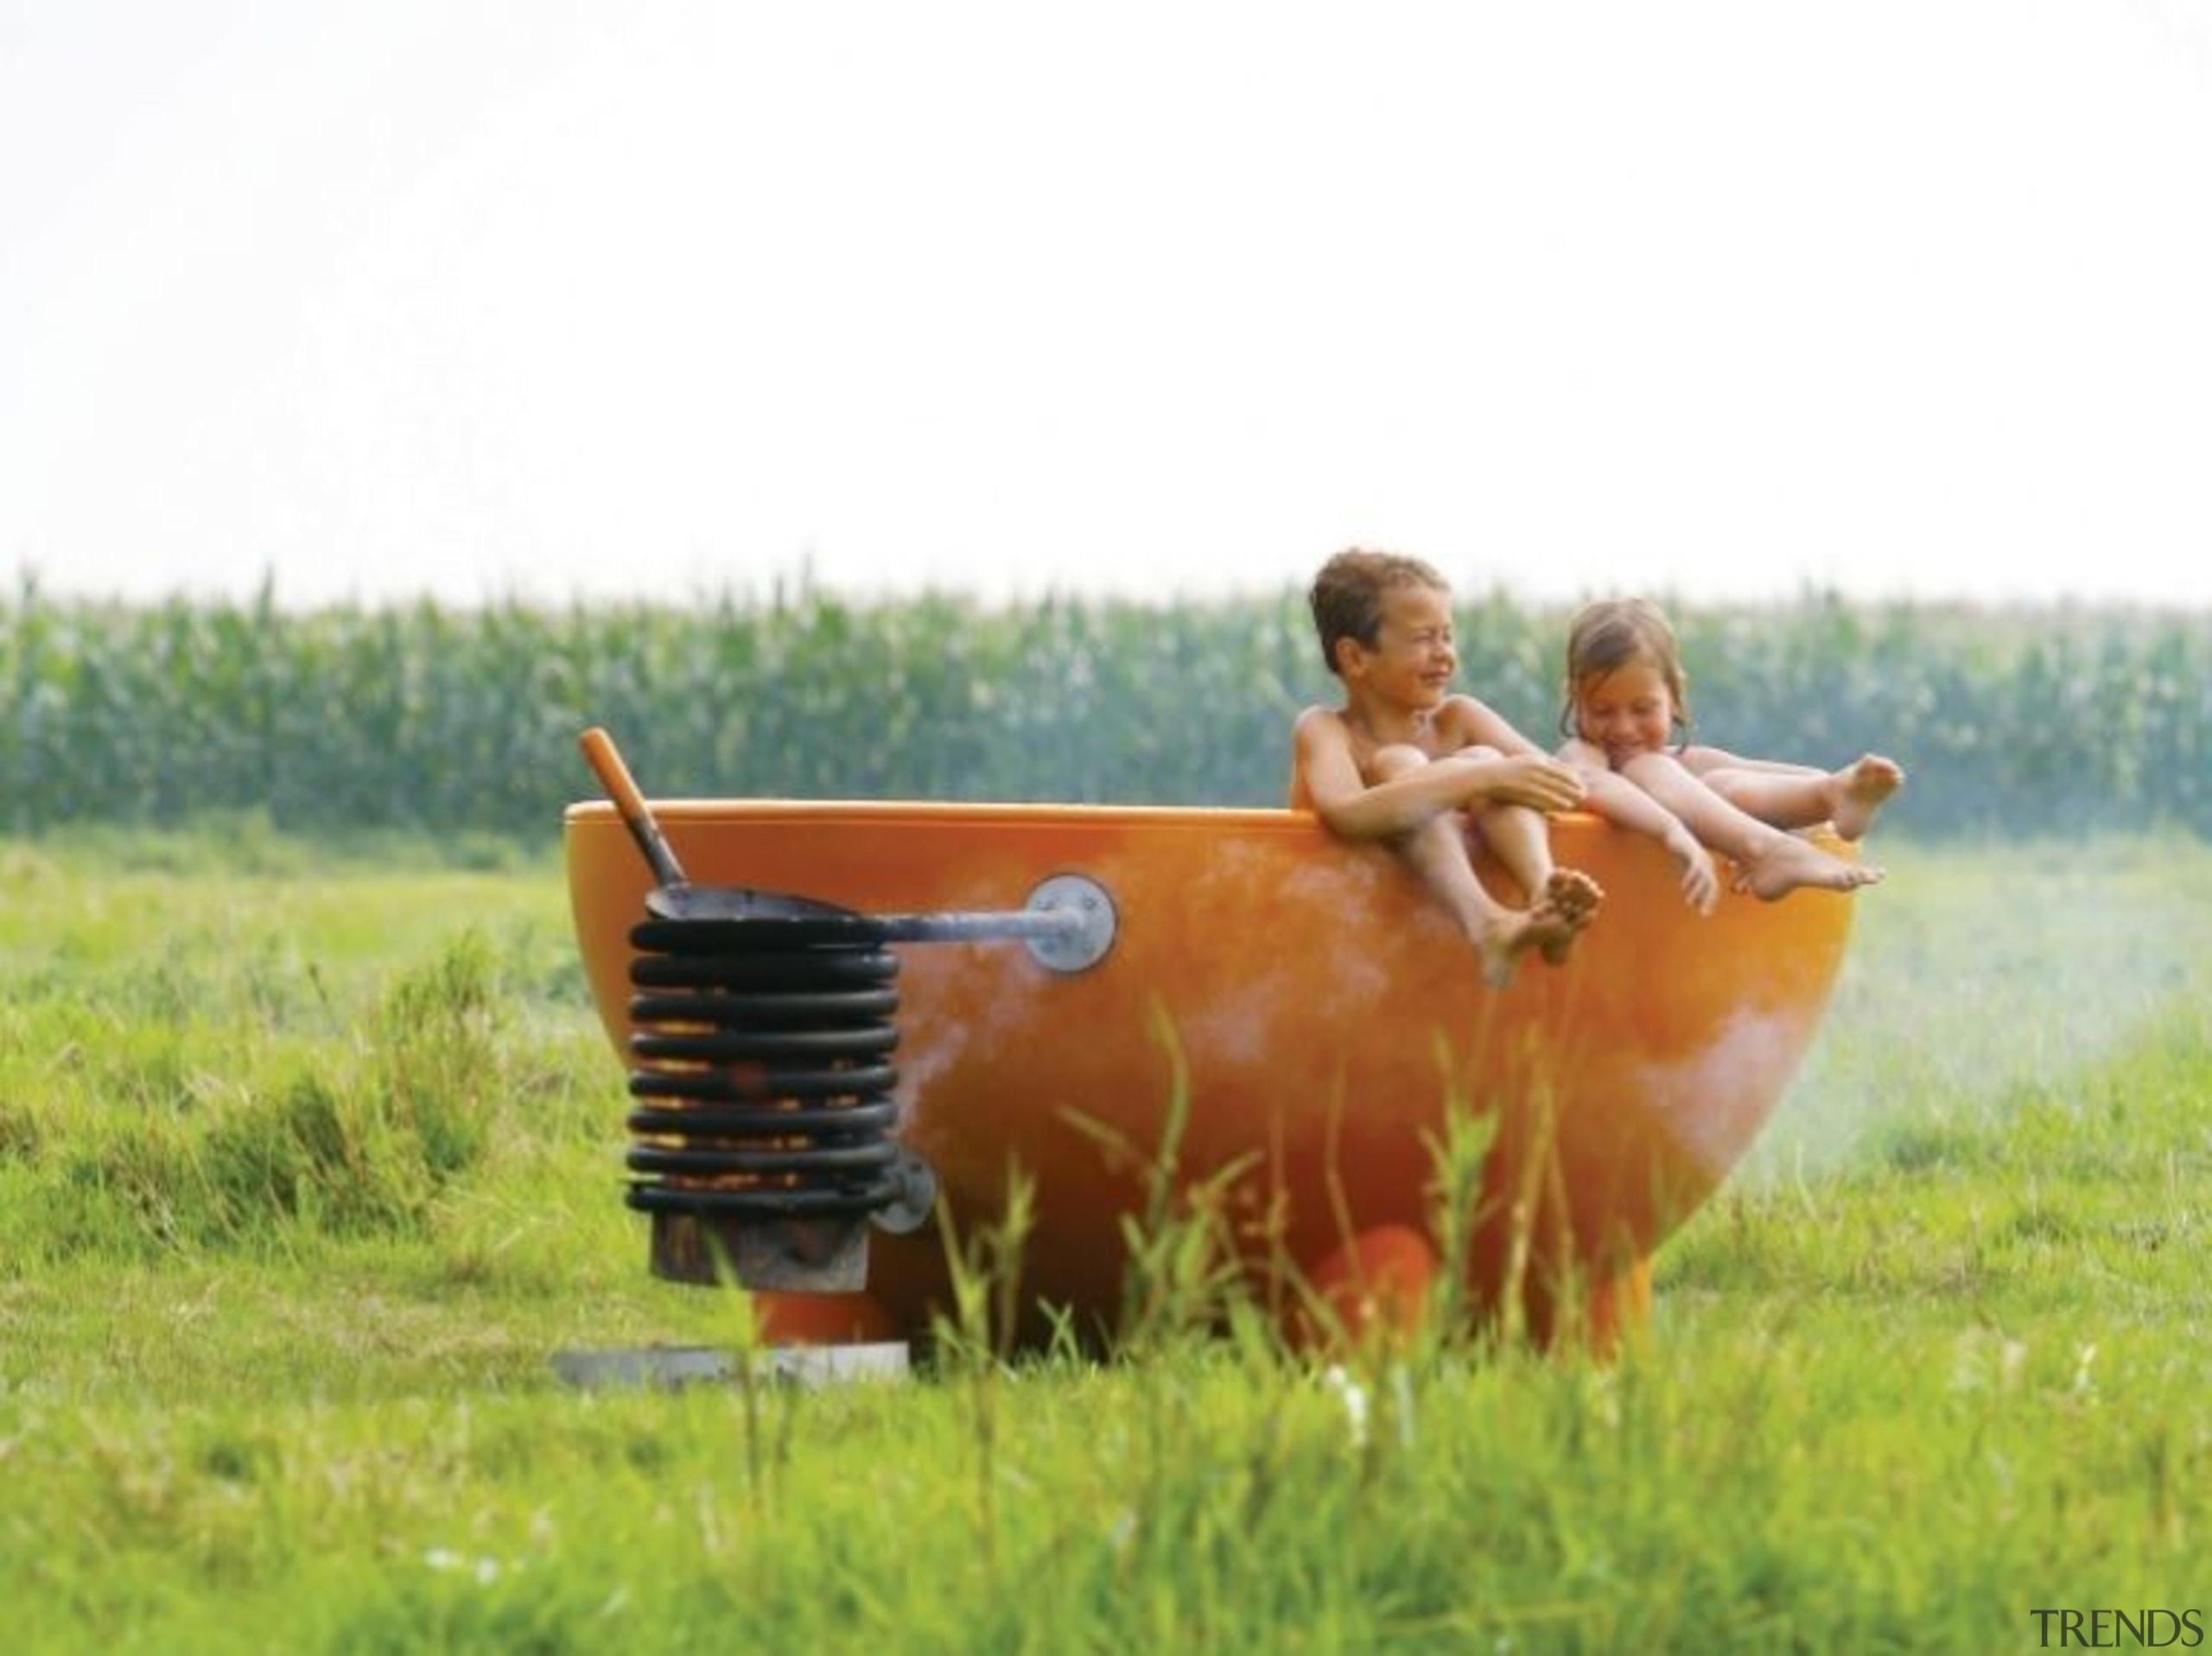 Outdoor Tub 02 - Outdoor Tub 02 - ecoregion, field, grass, grassland, meadow, pasture, prairie, rural area, steppe, white